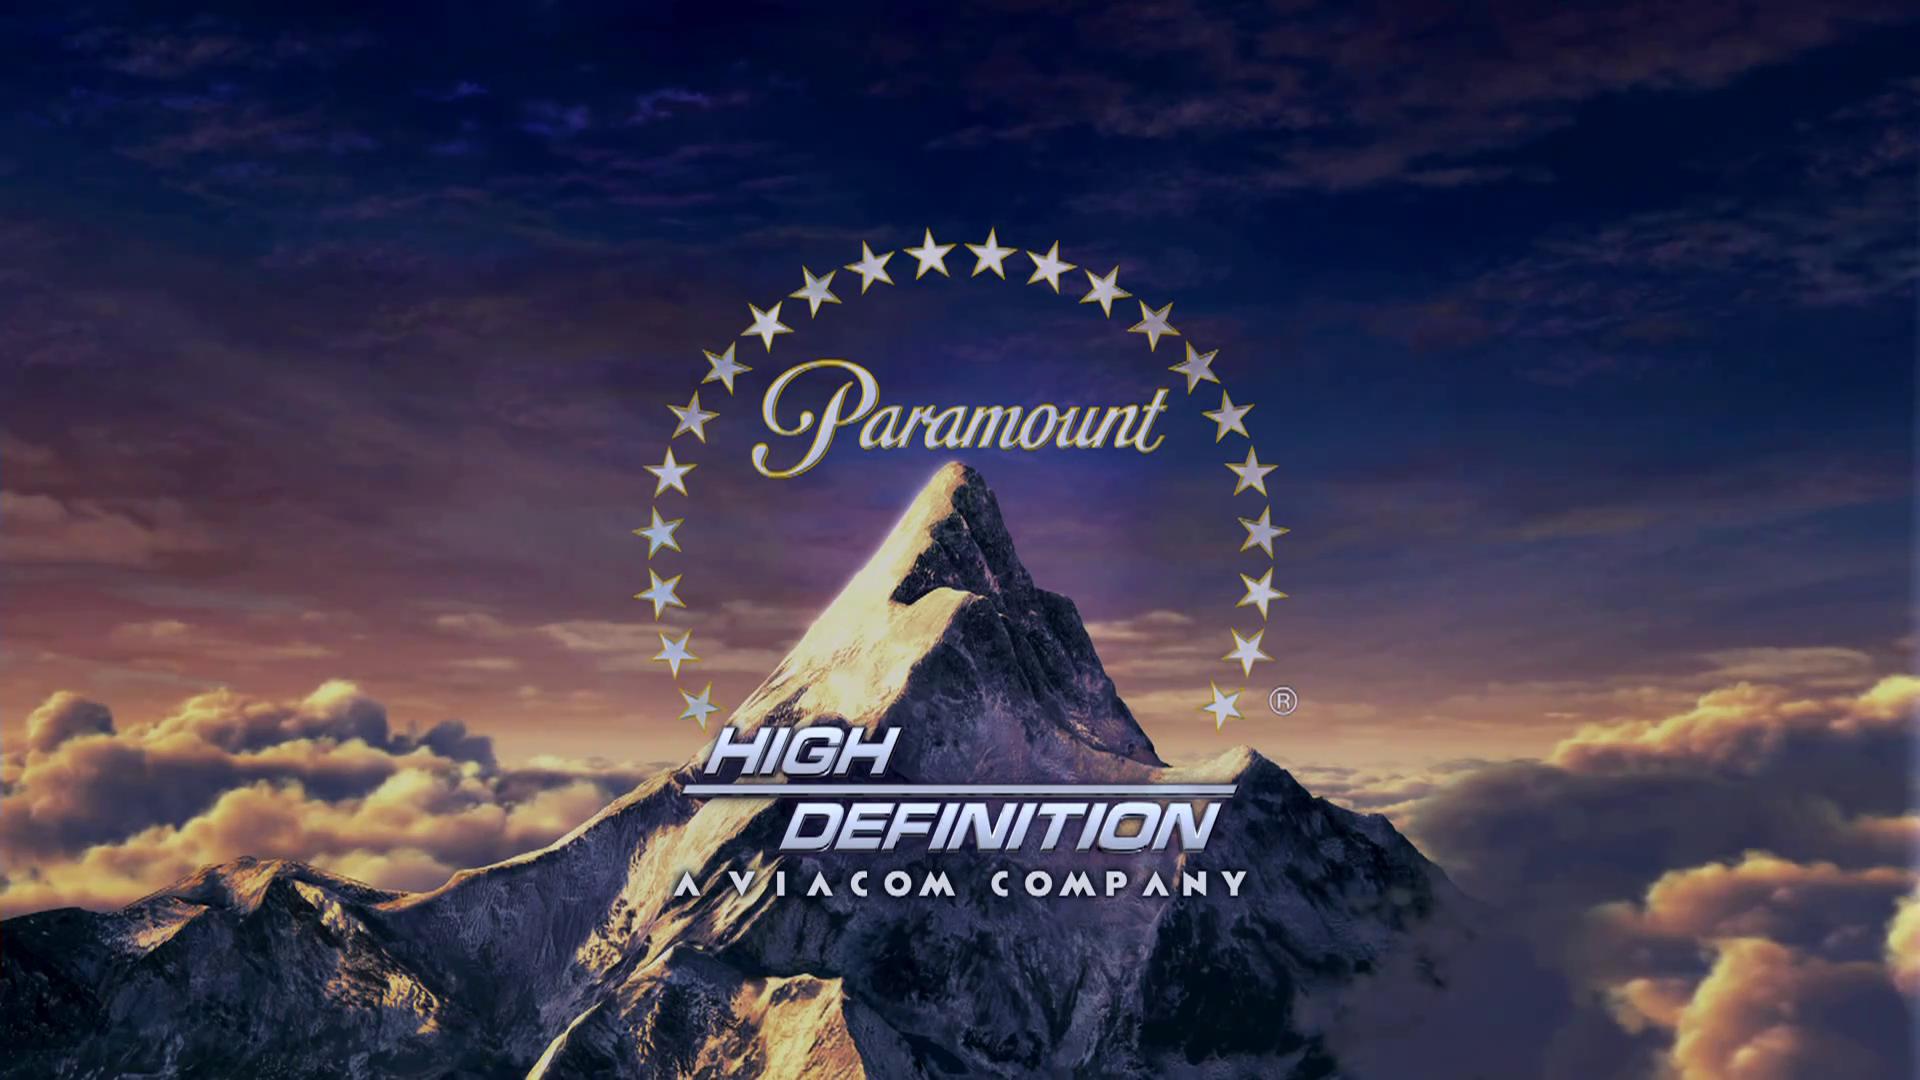 Paramount High Definition